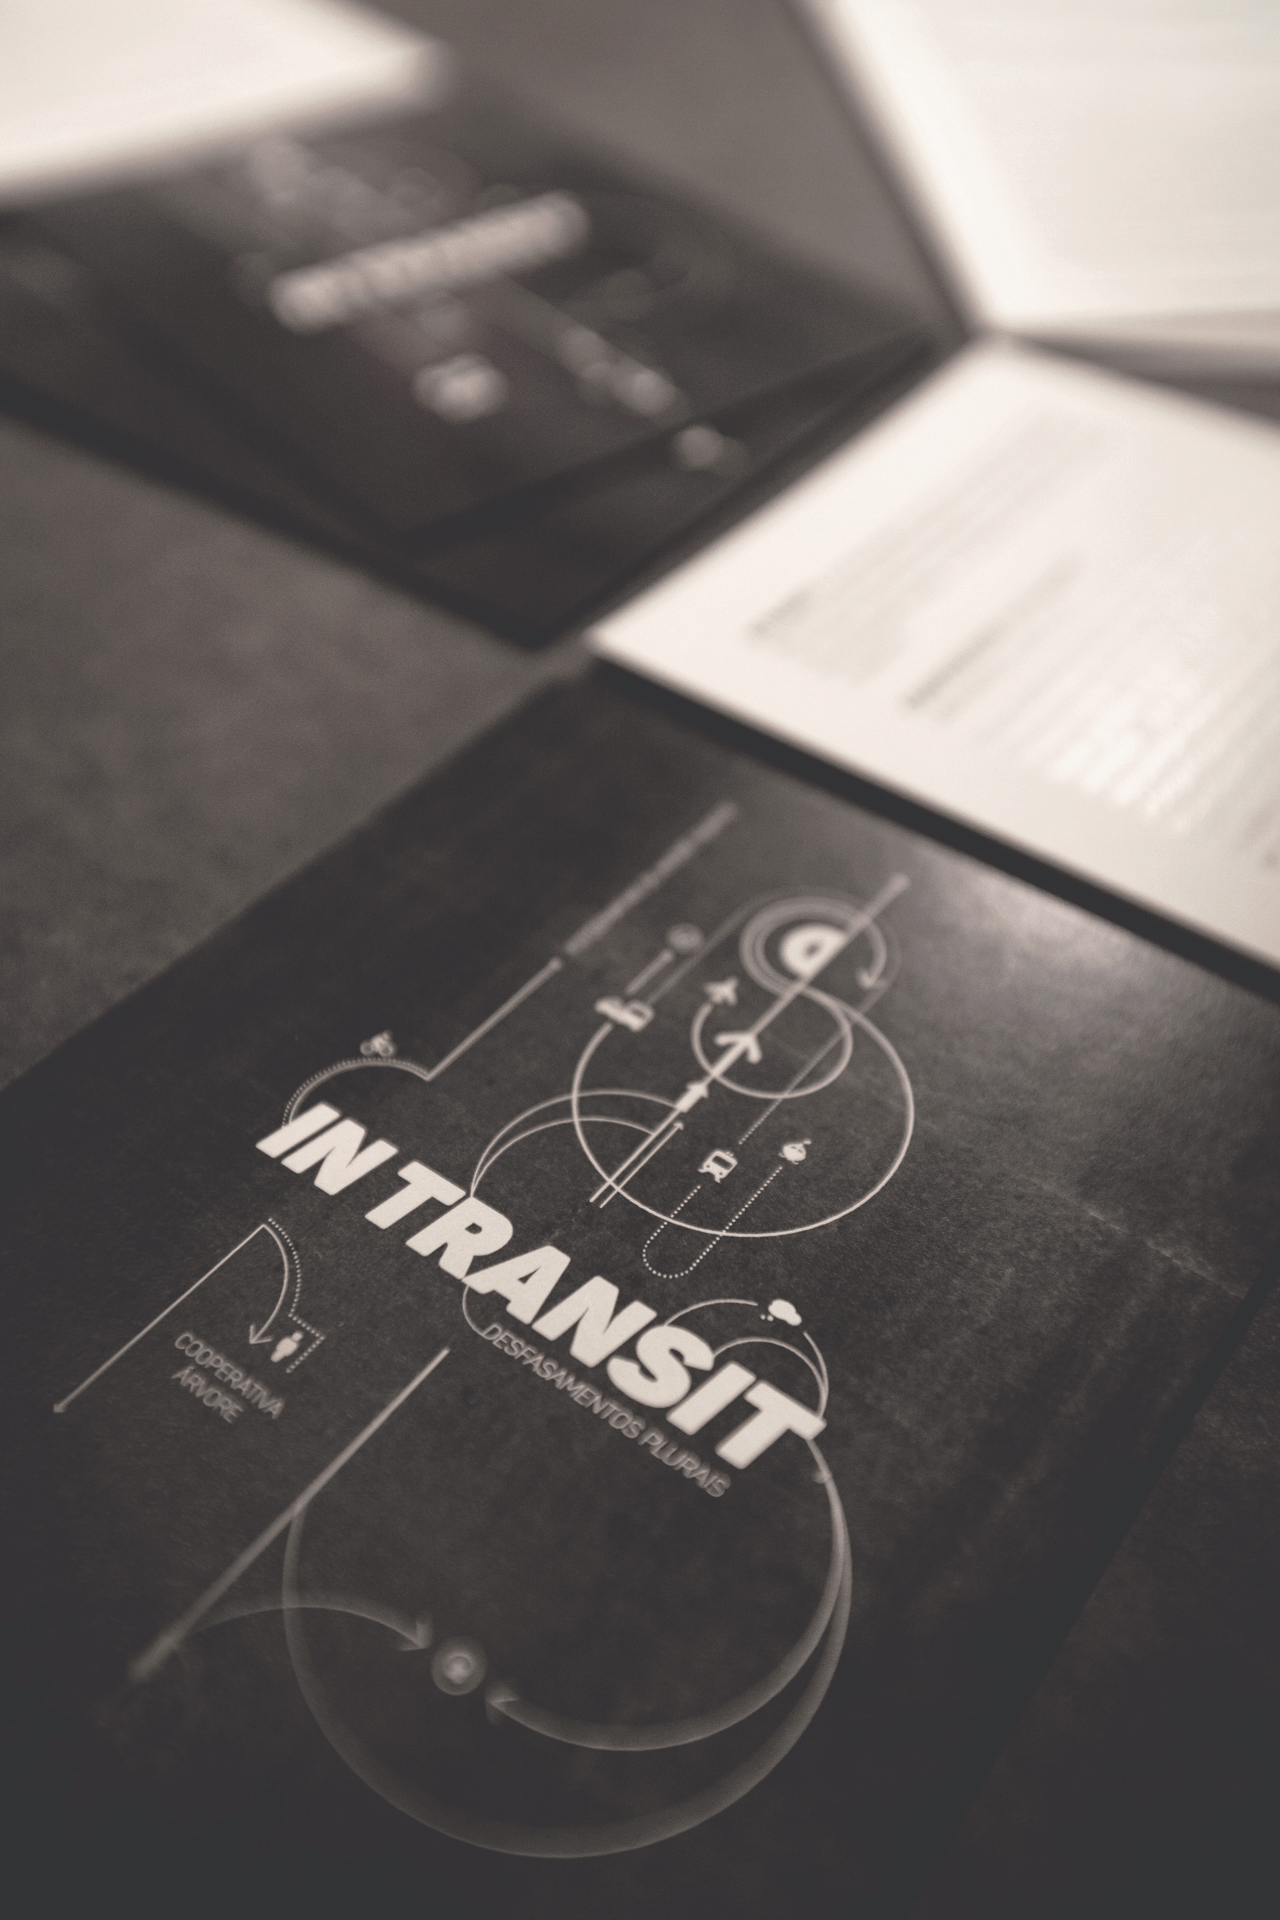 In+Transit+bonjourmolotov+André+Gigante+Experimenta+Design+2015+EXD15+Photography+Exhibition+Exposição+Fotografia+Cooperativa+Árvore+18 N3B.jpg